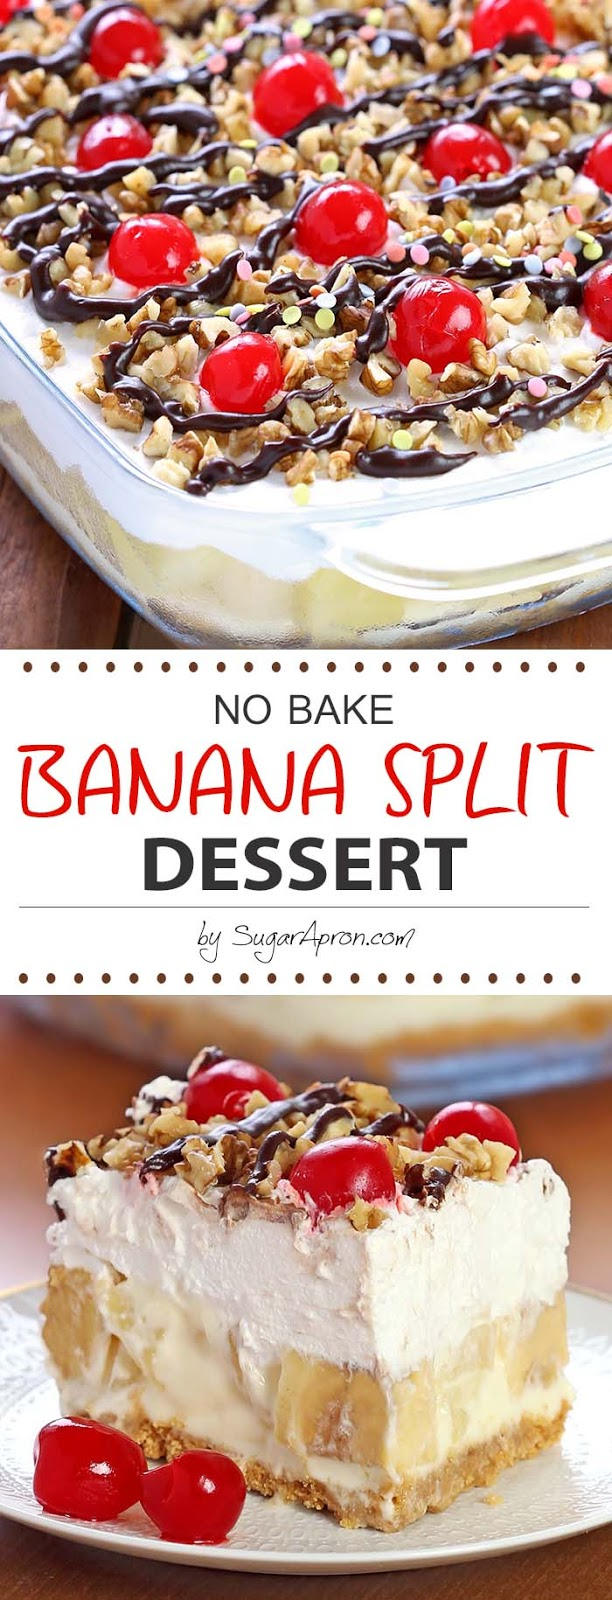 No Bake Banana Split Dessert Recipes